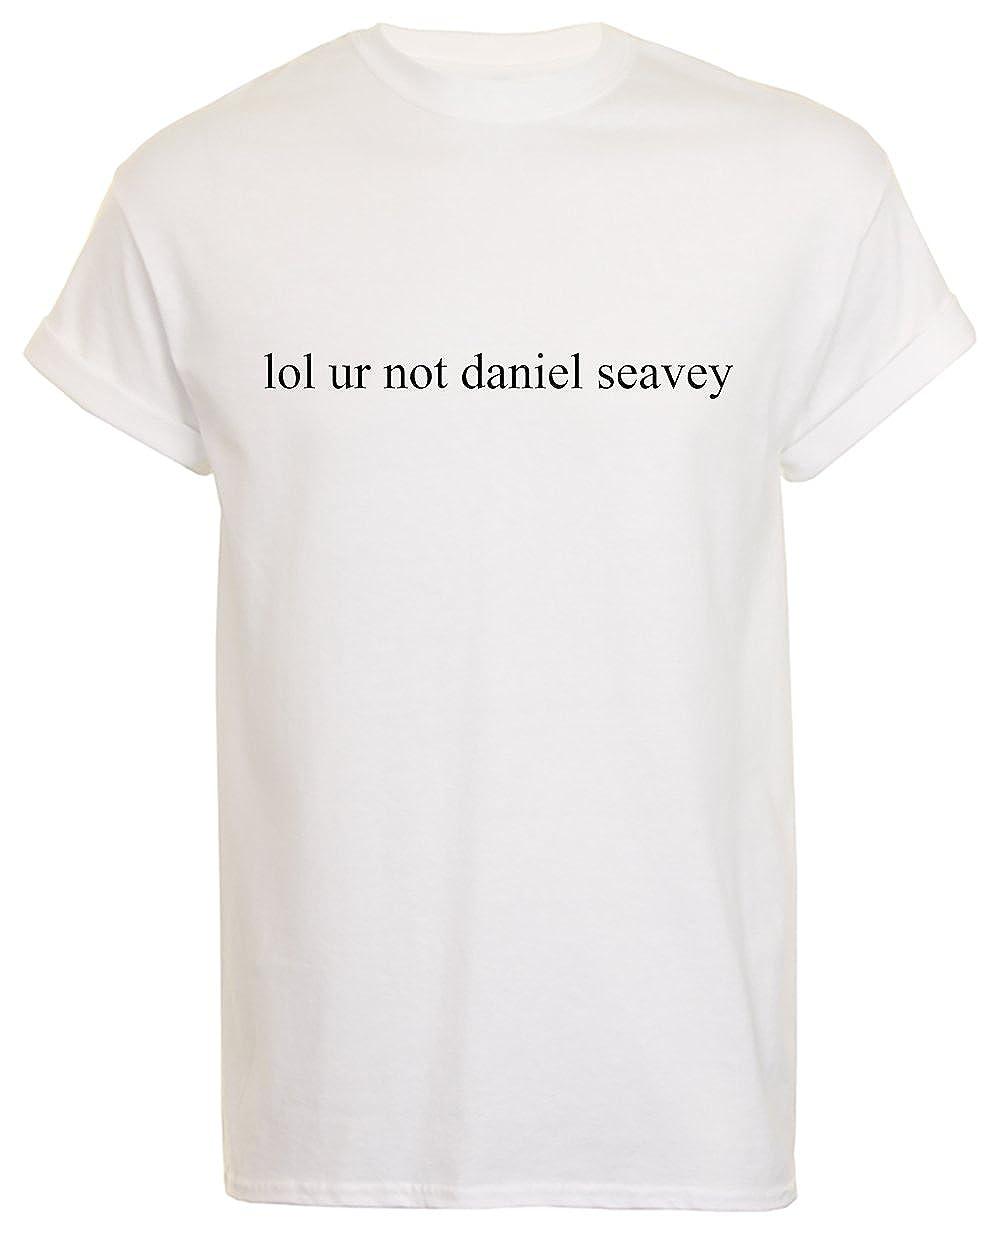 ce9deabf0 TeeIsland LOL ur not zach Herron Daniel seavey Jonah Marais Corbyn Besson T  Shirt: Amazon.co.uk: Clothing